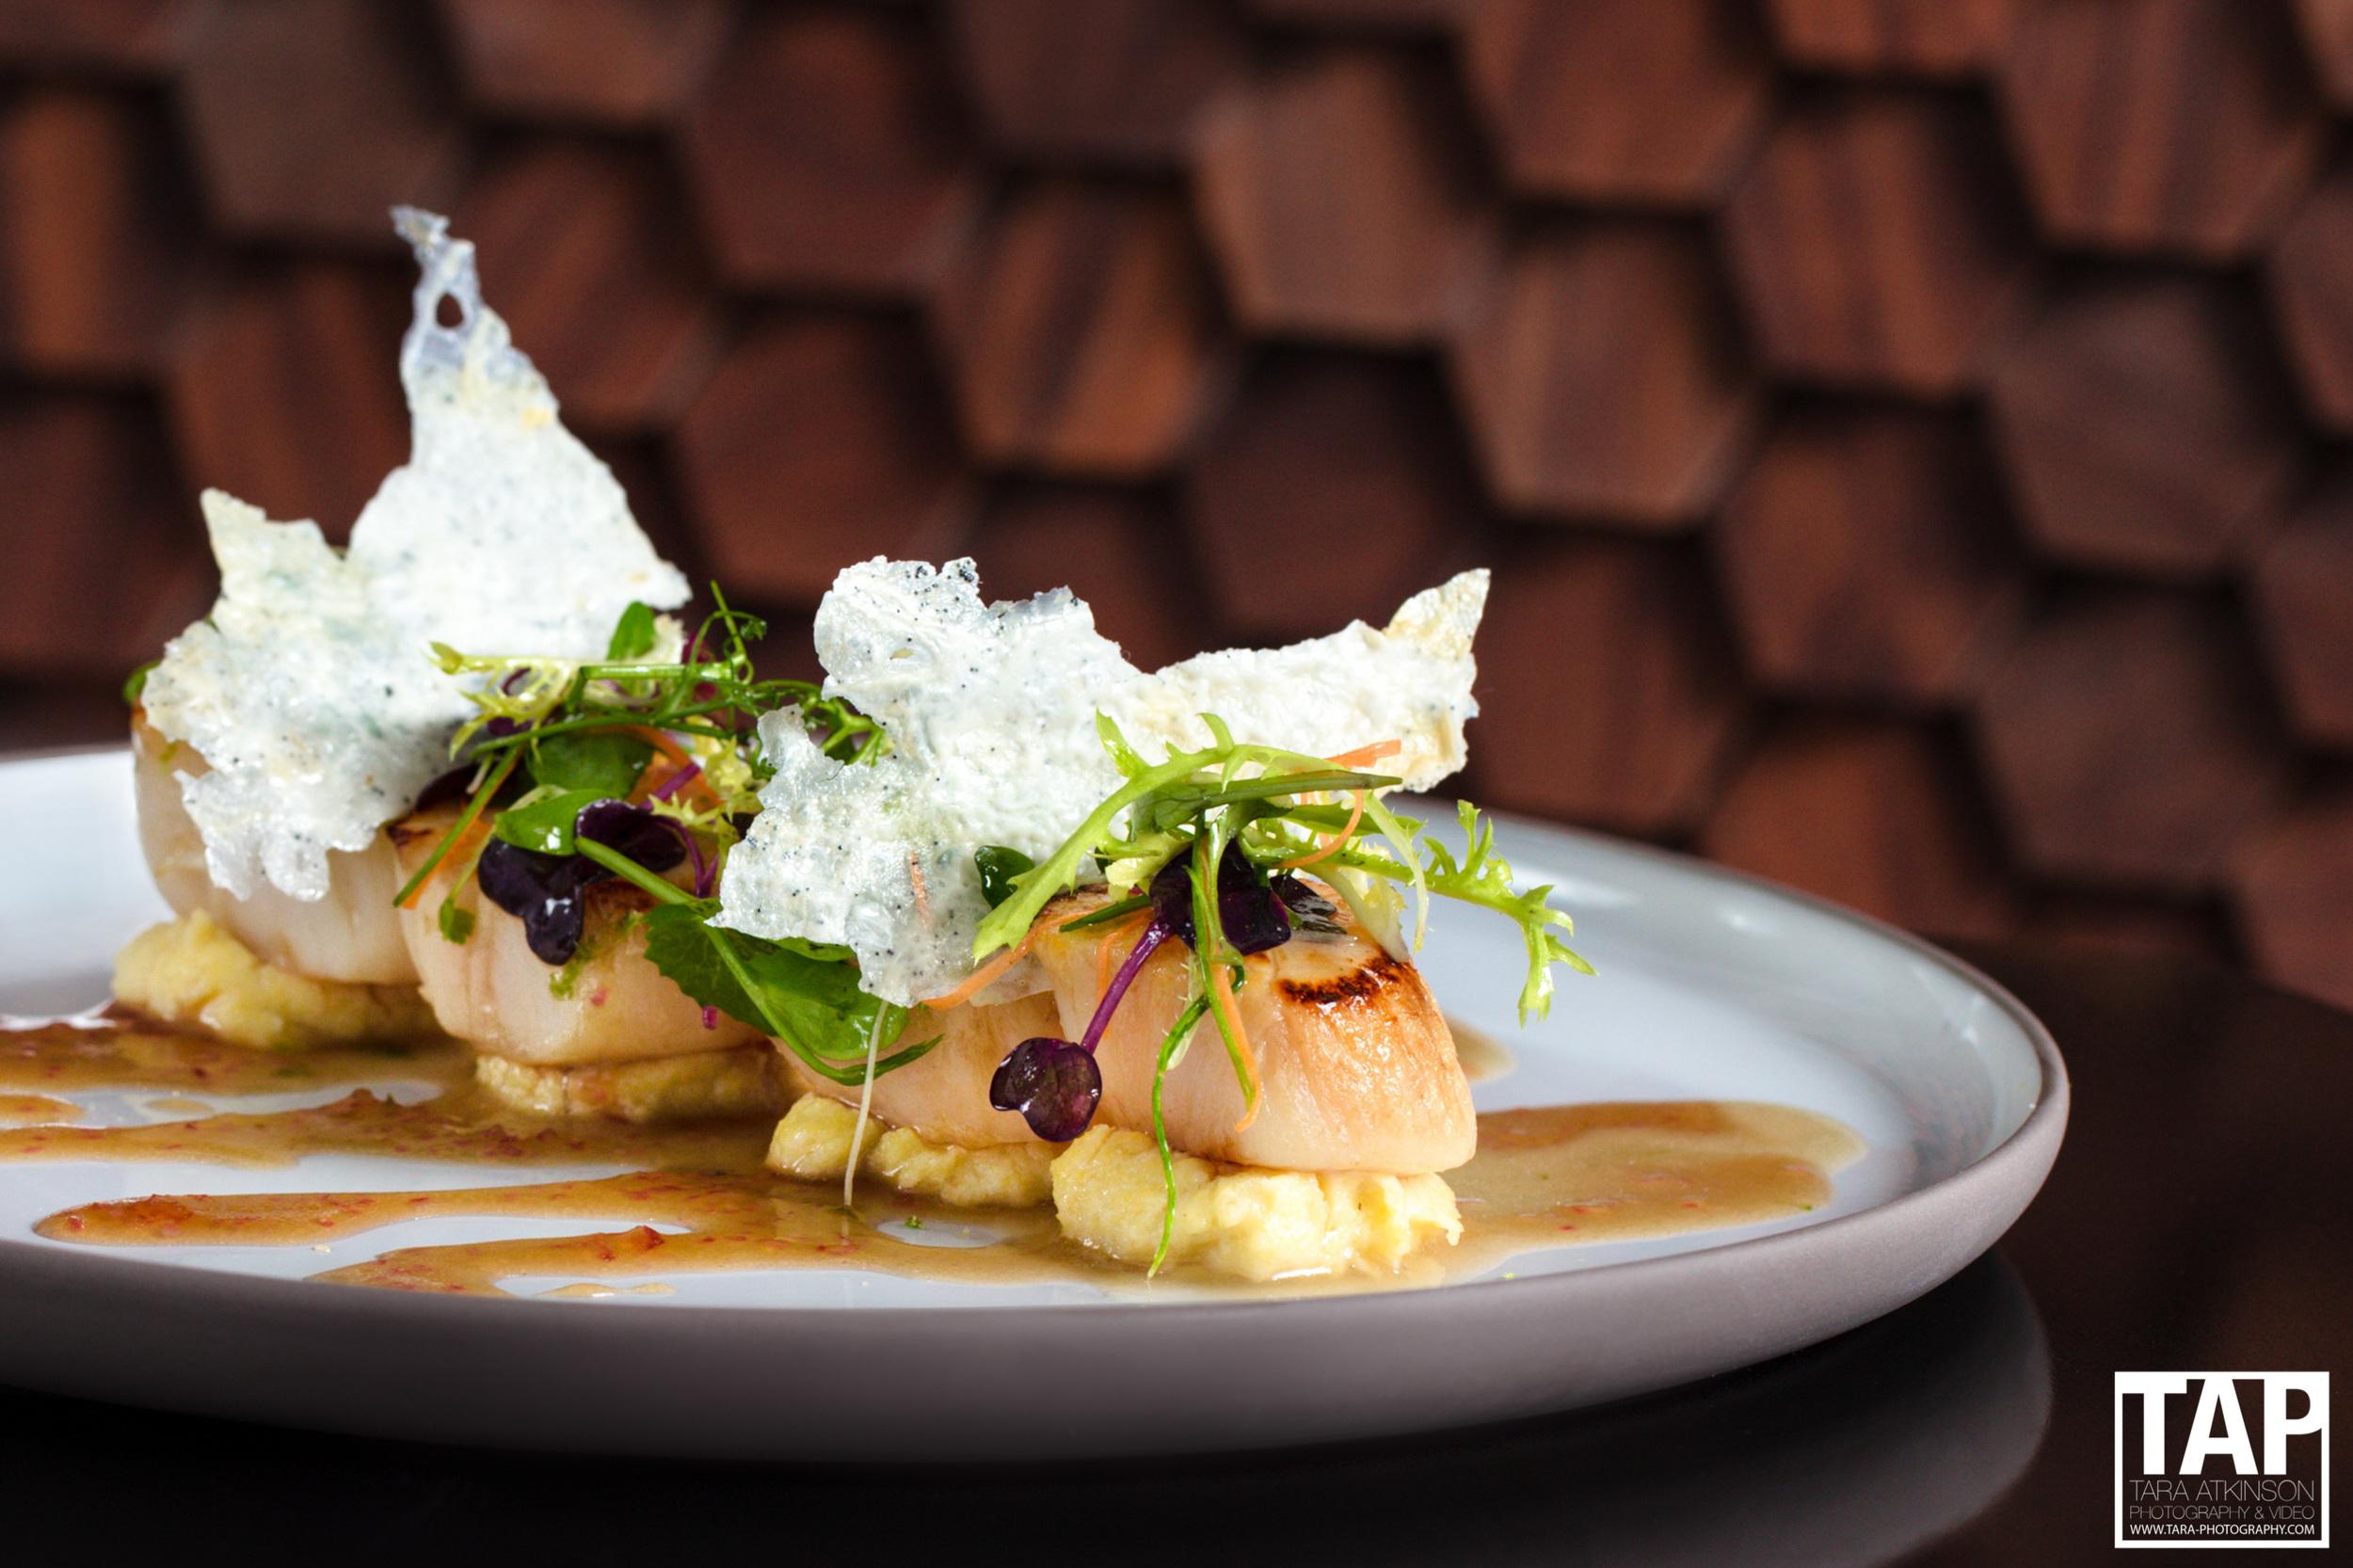 Tara Atkinson food Photography & styling_3.jpg